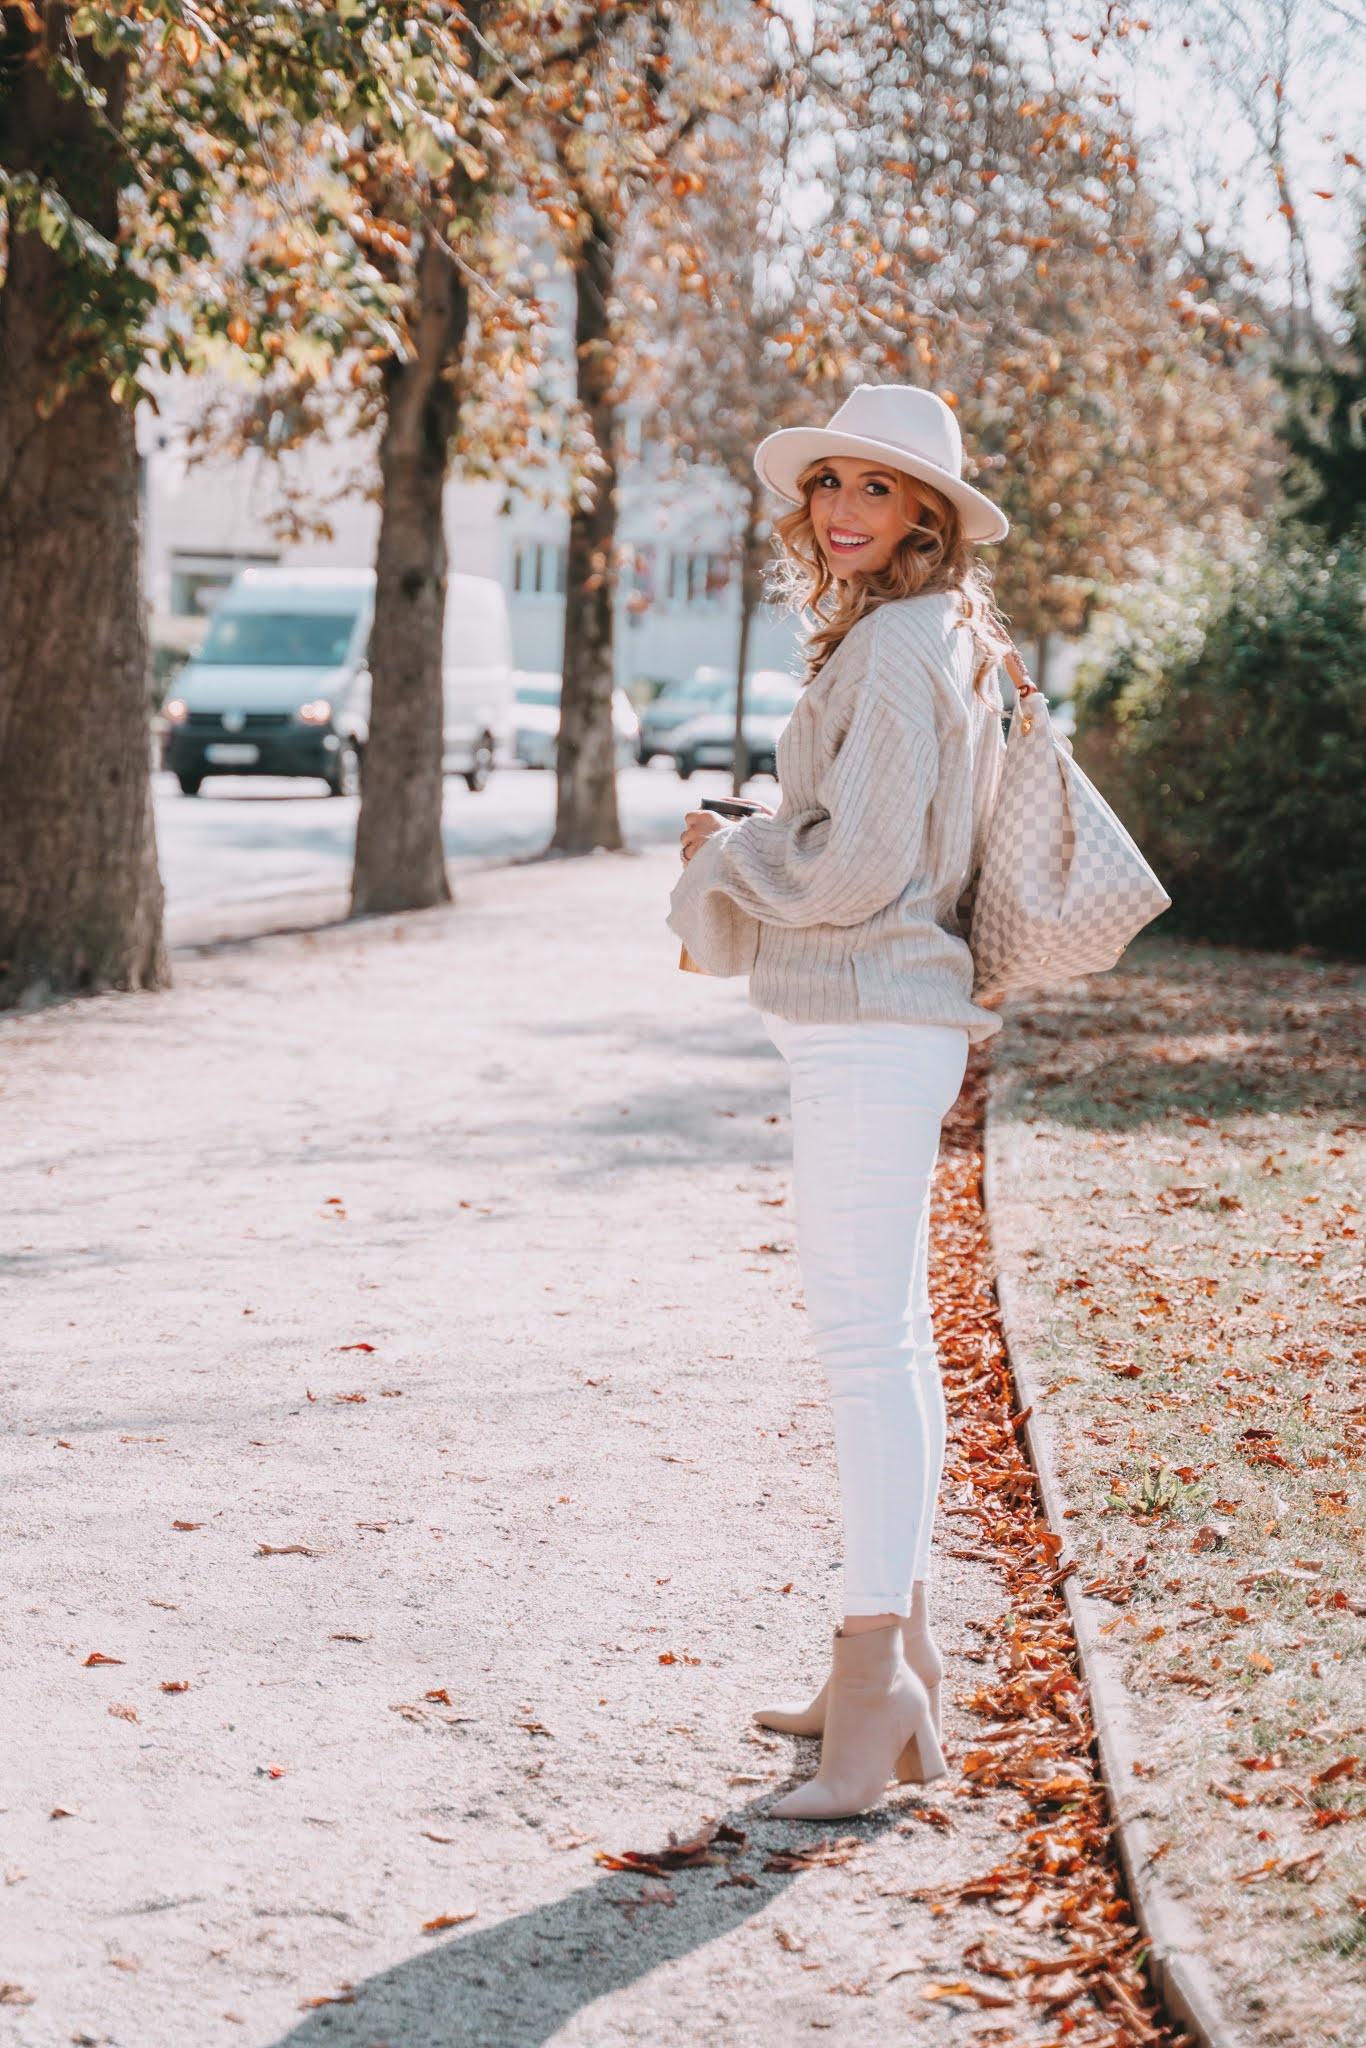 ein-edles-Outfit-in-creme-Tönen-